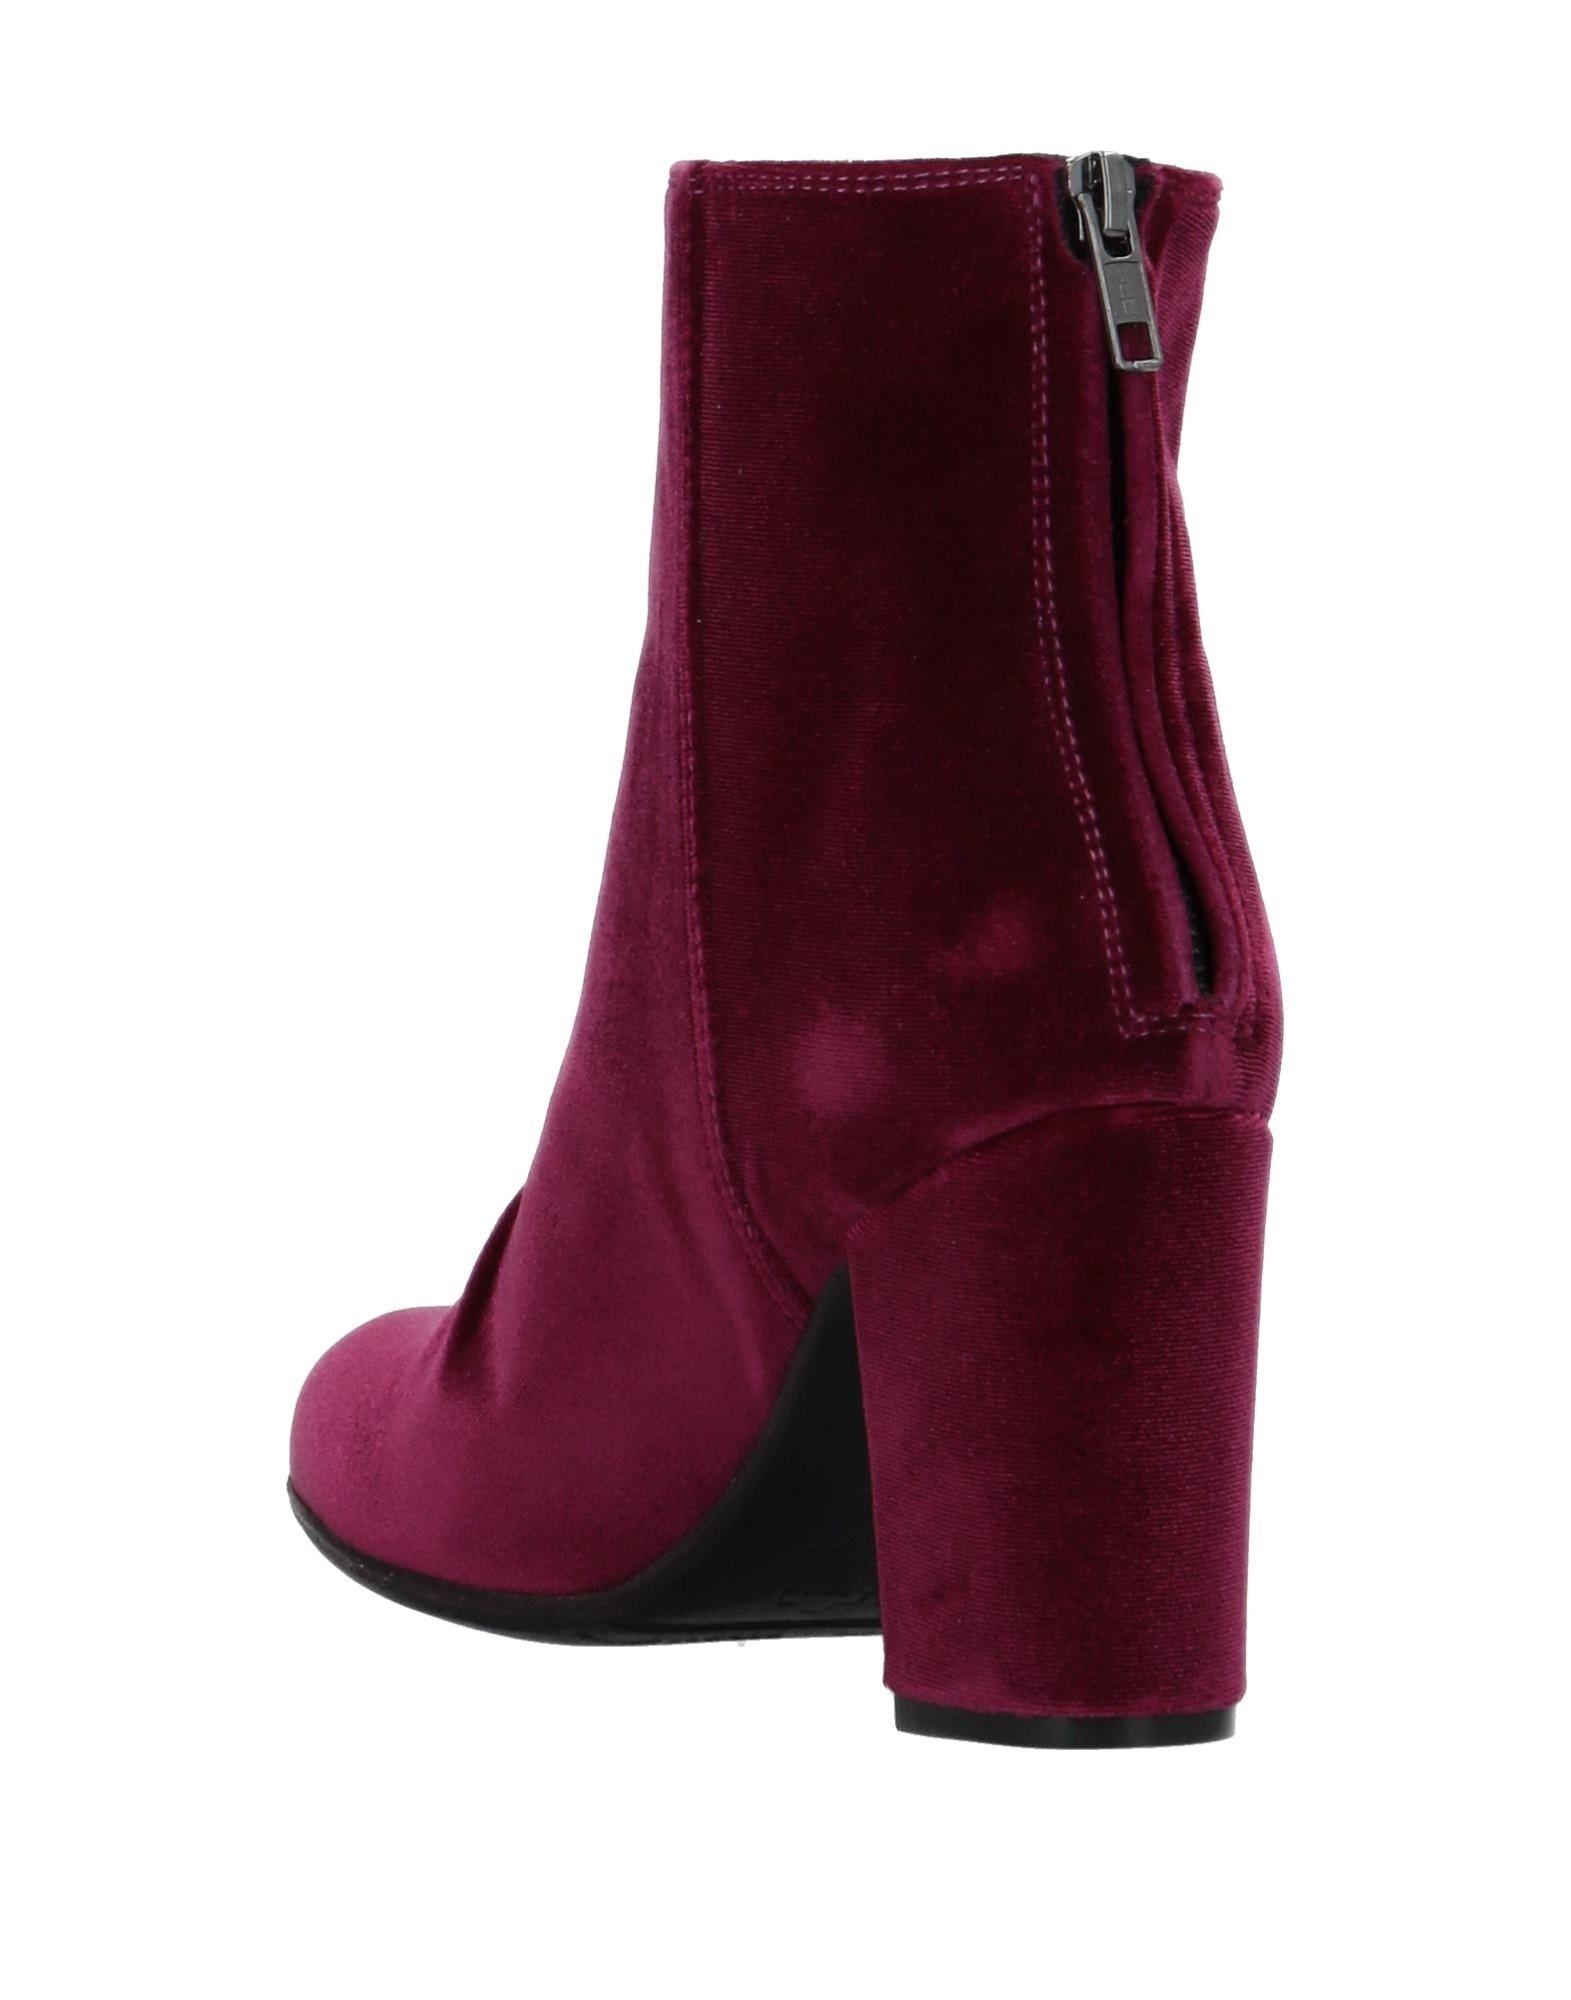 Via Roma 15 Stiefelette Neue Damen  11537780SW Neue Stiefelette Schuhe 0cddc5